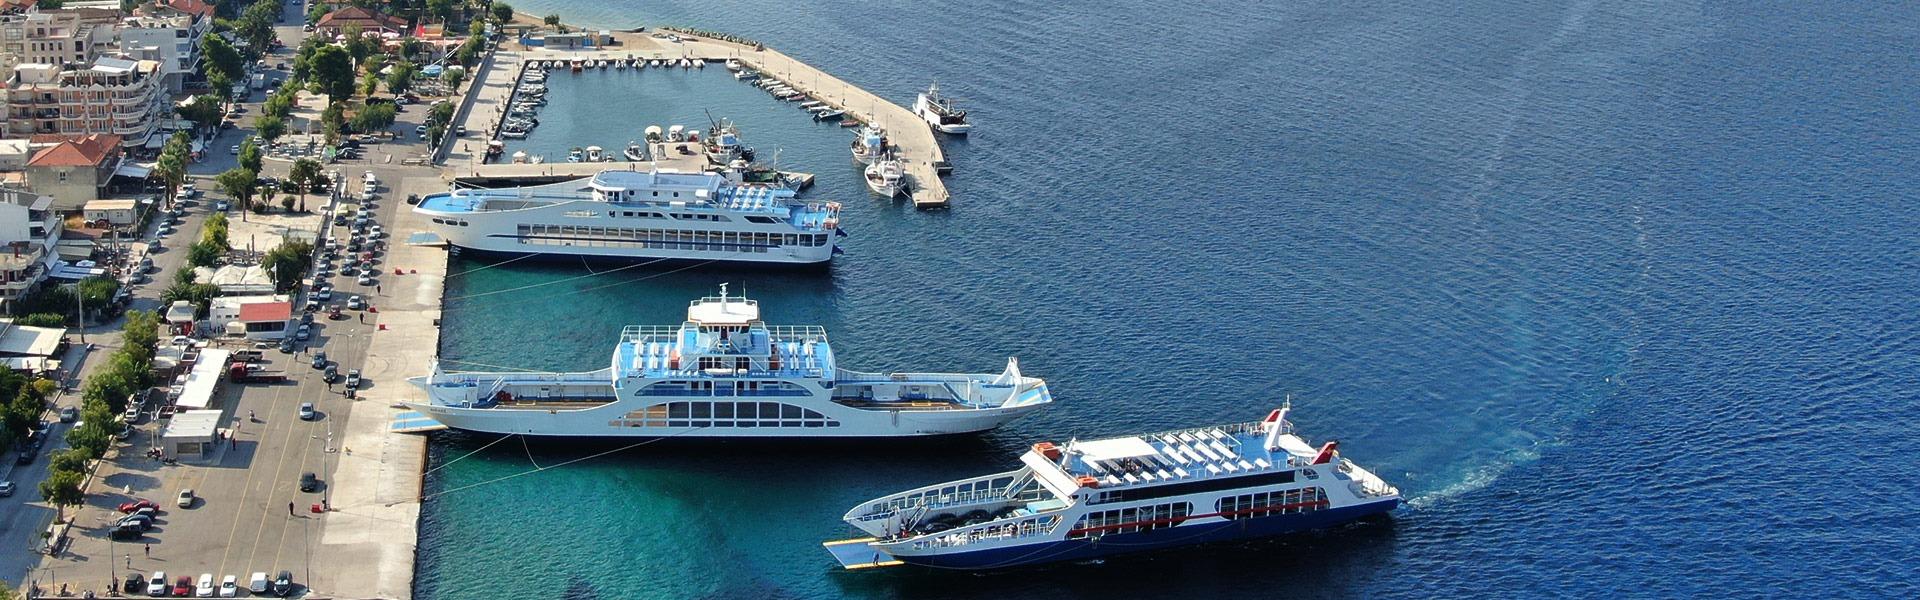 Ferry Boat Arkitsa - Edipsos